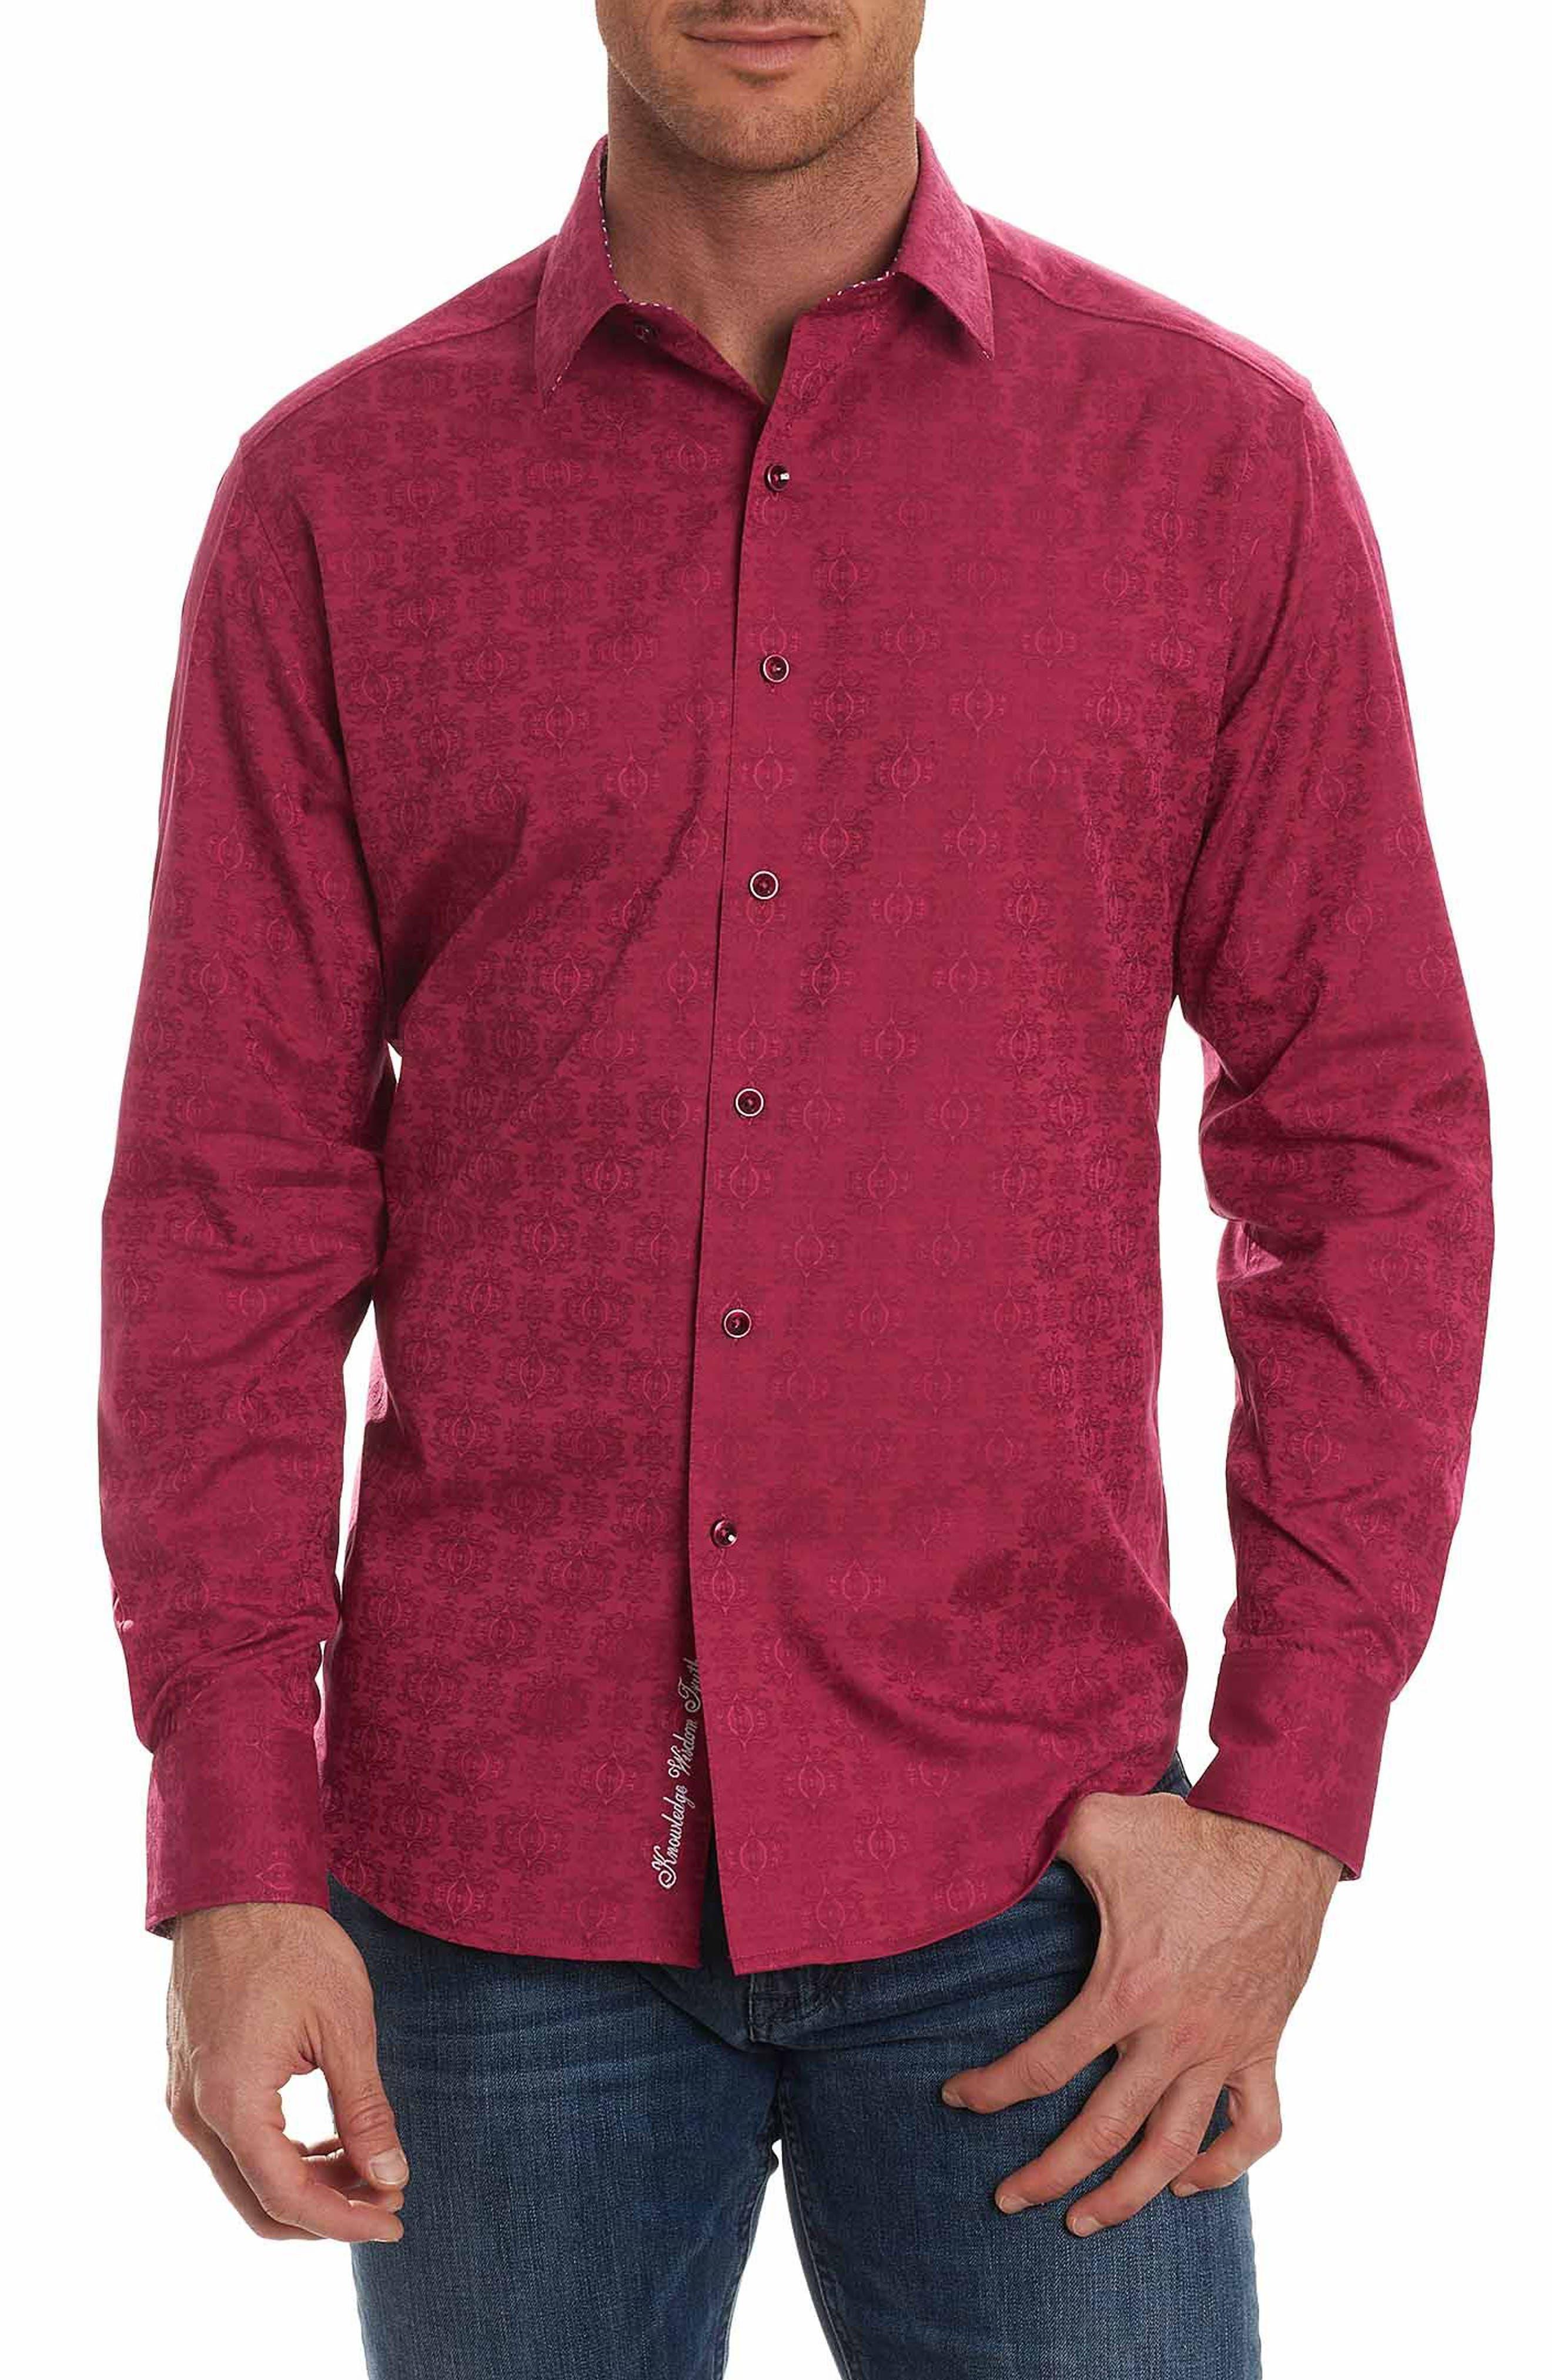 Cullen Classic Fit Jacquard Sport Shirt,                         Main,                         color, Rose